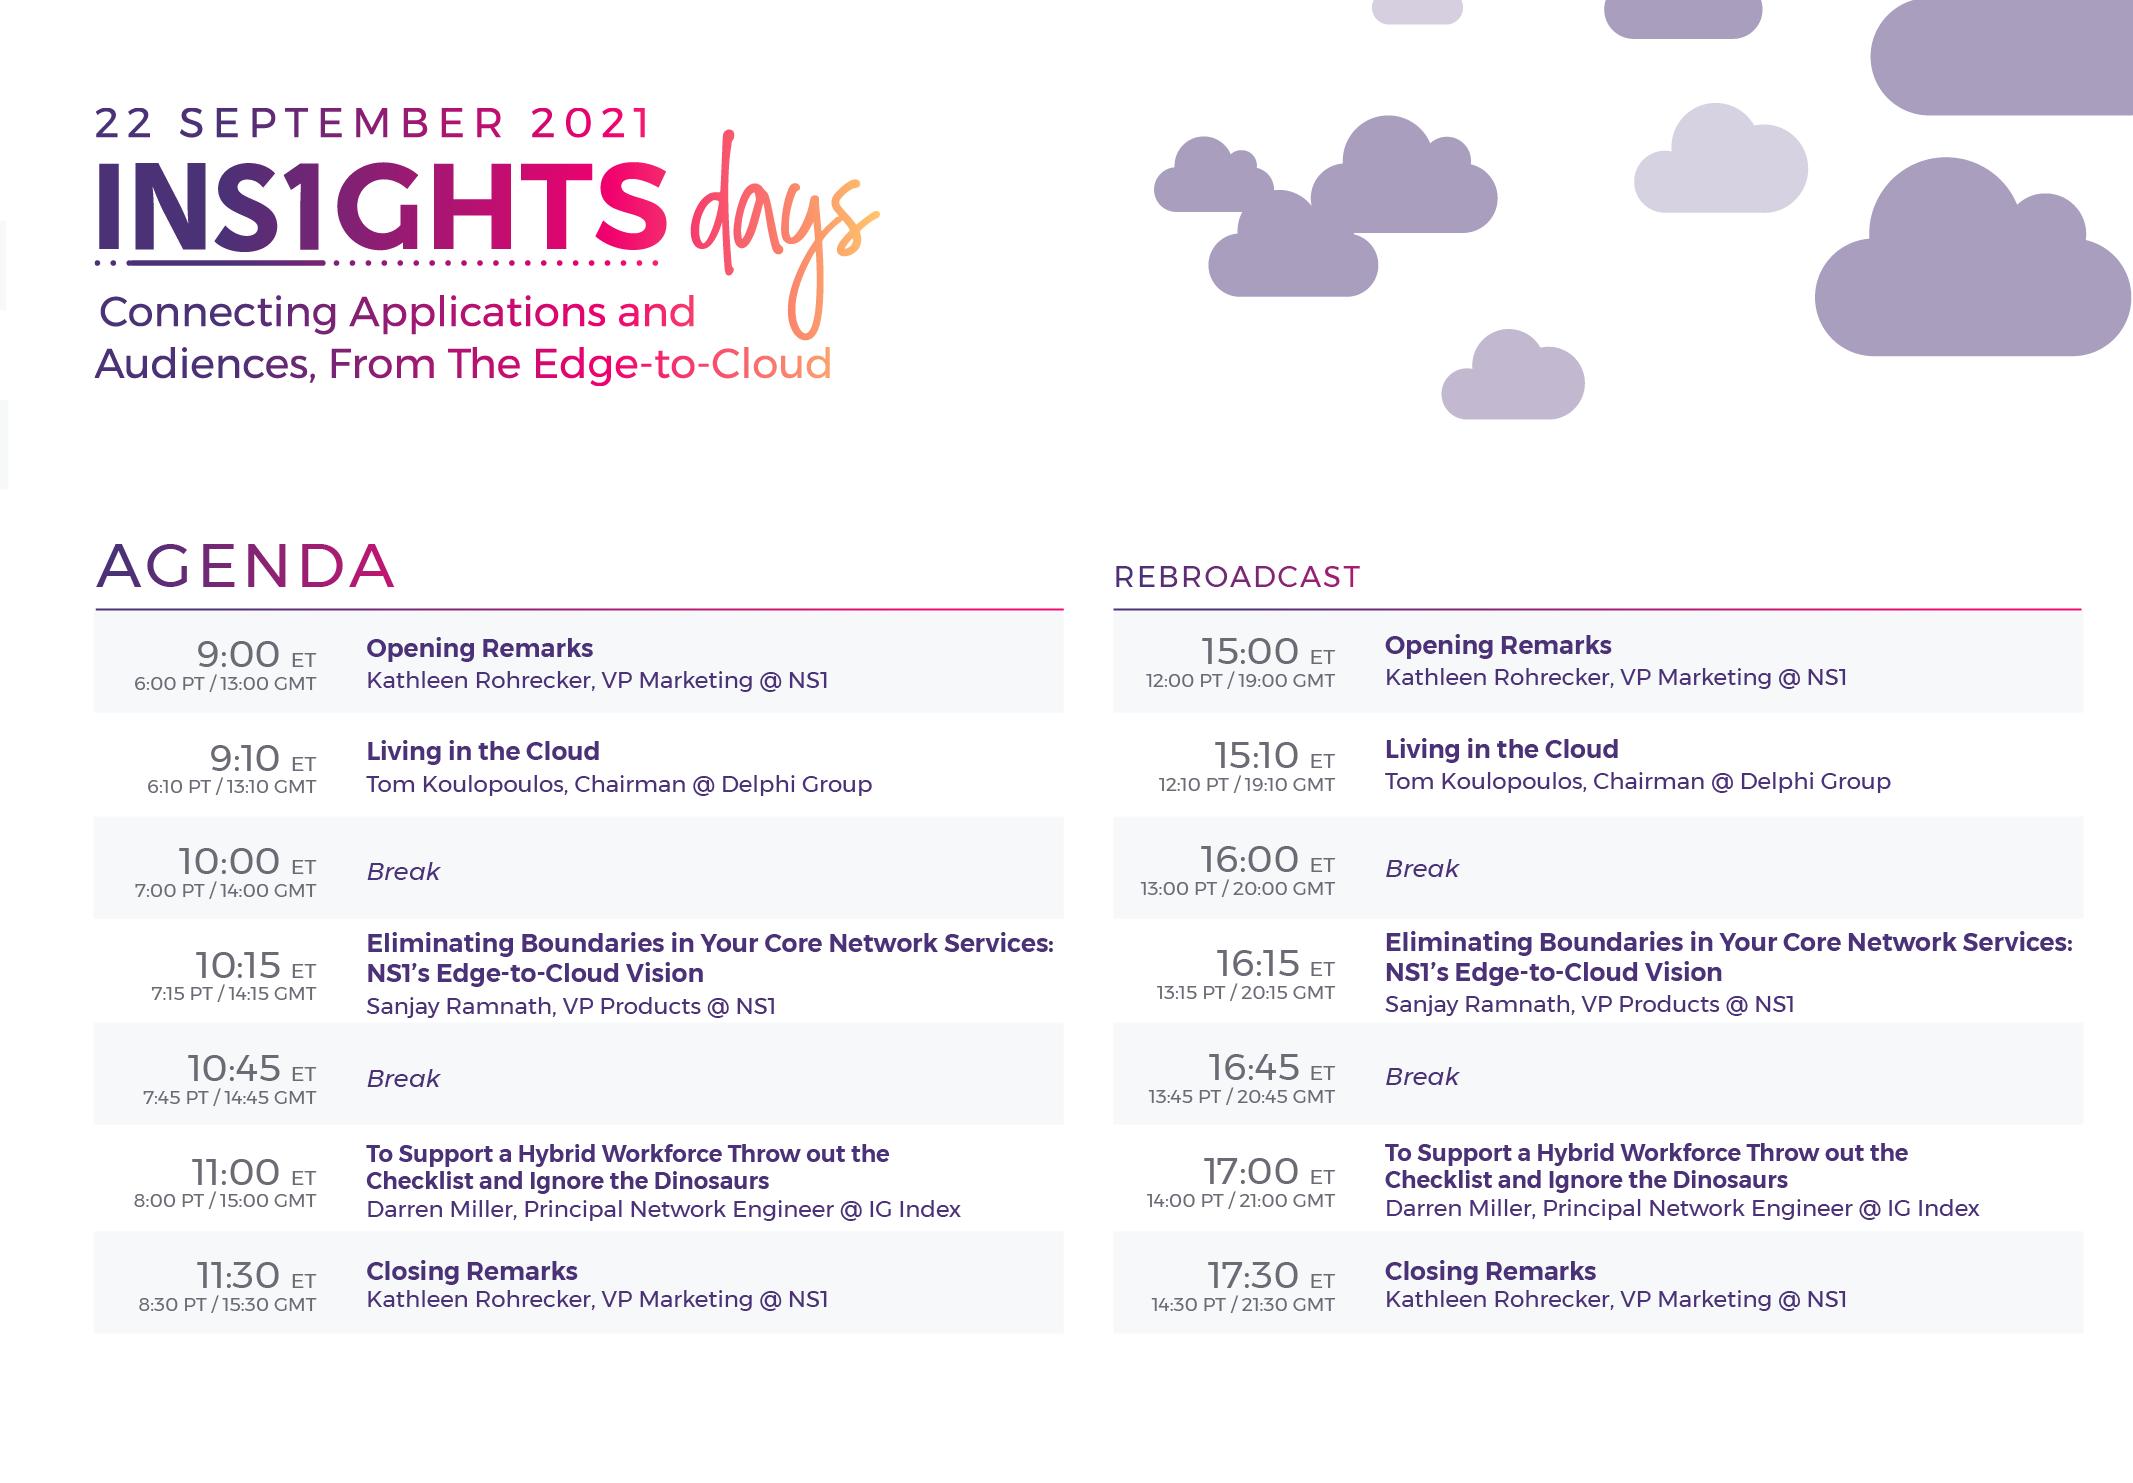 2021_INS1GHTS Days September Agenda